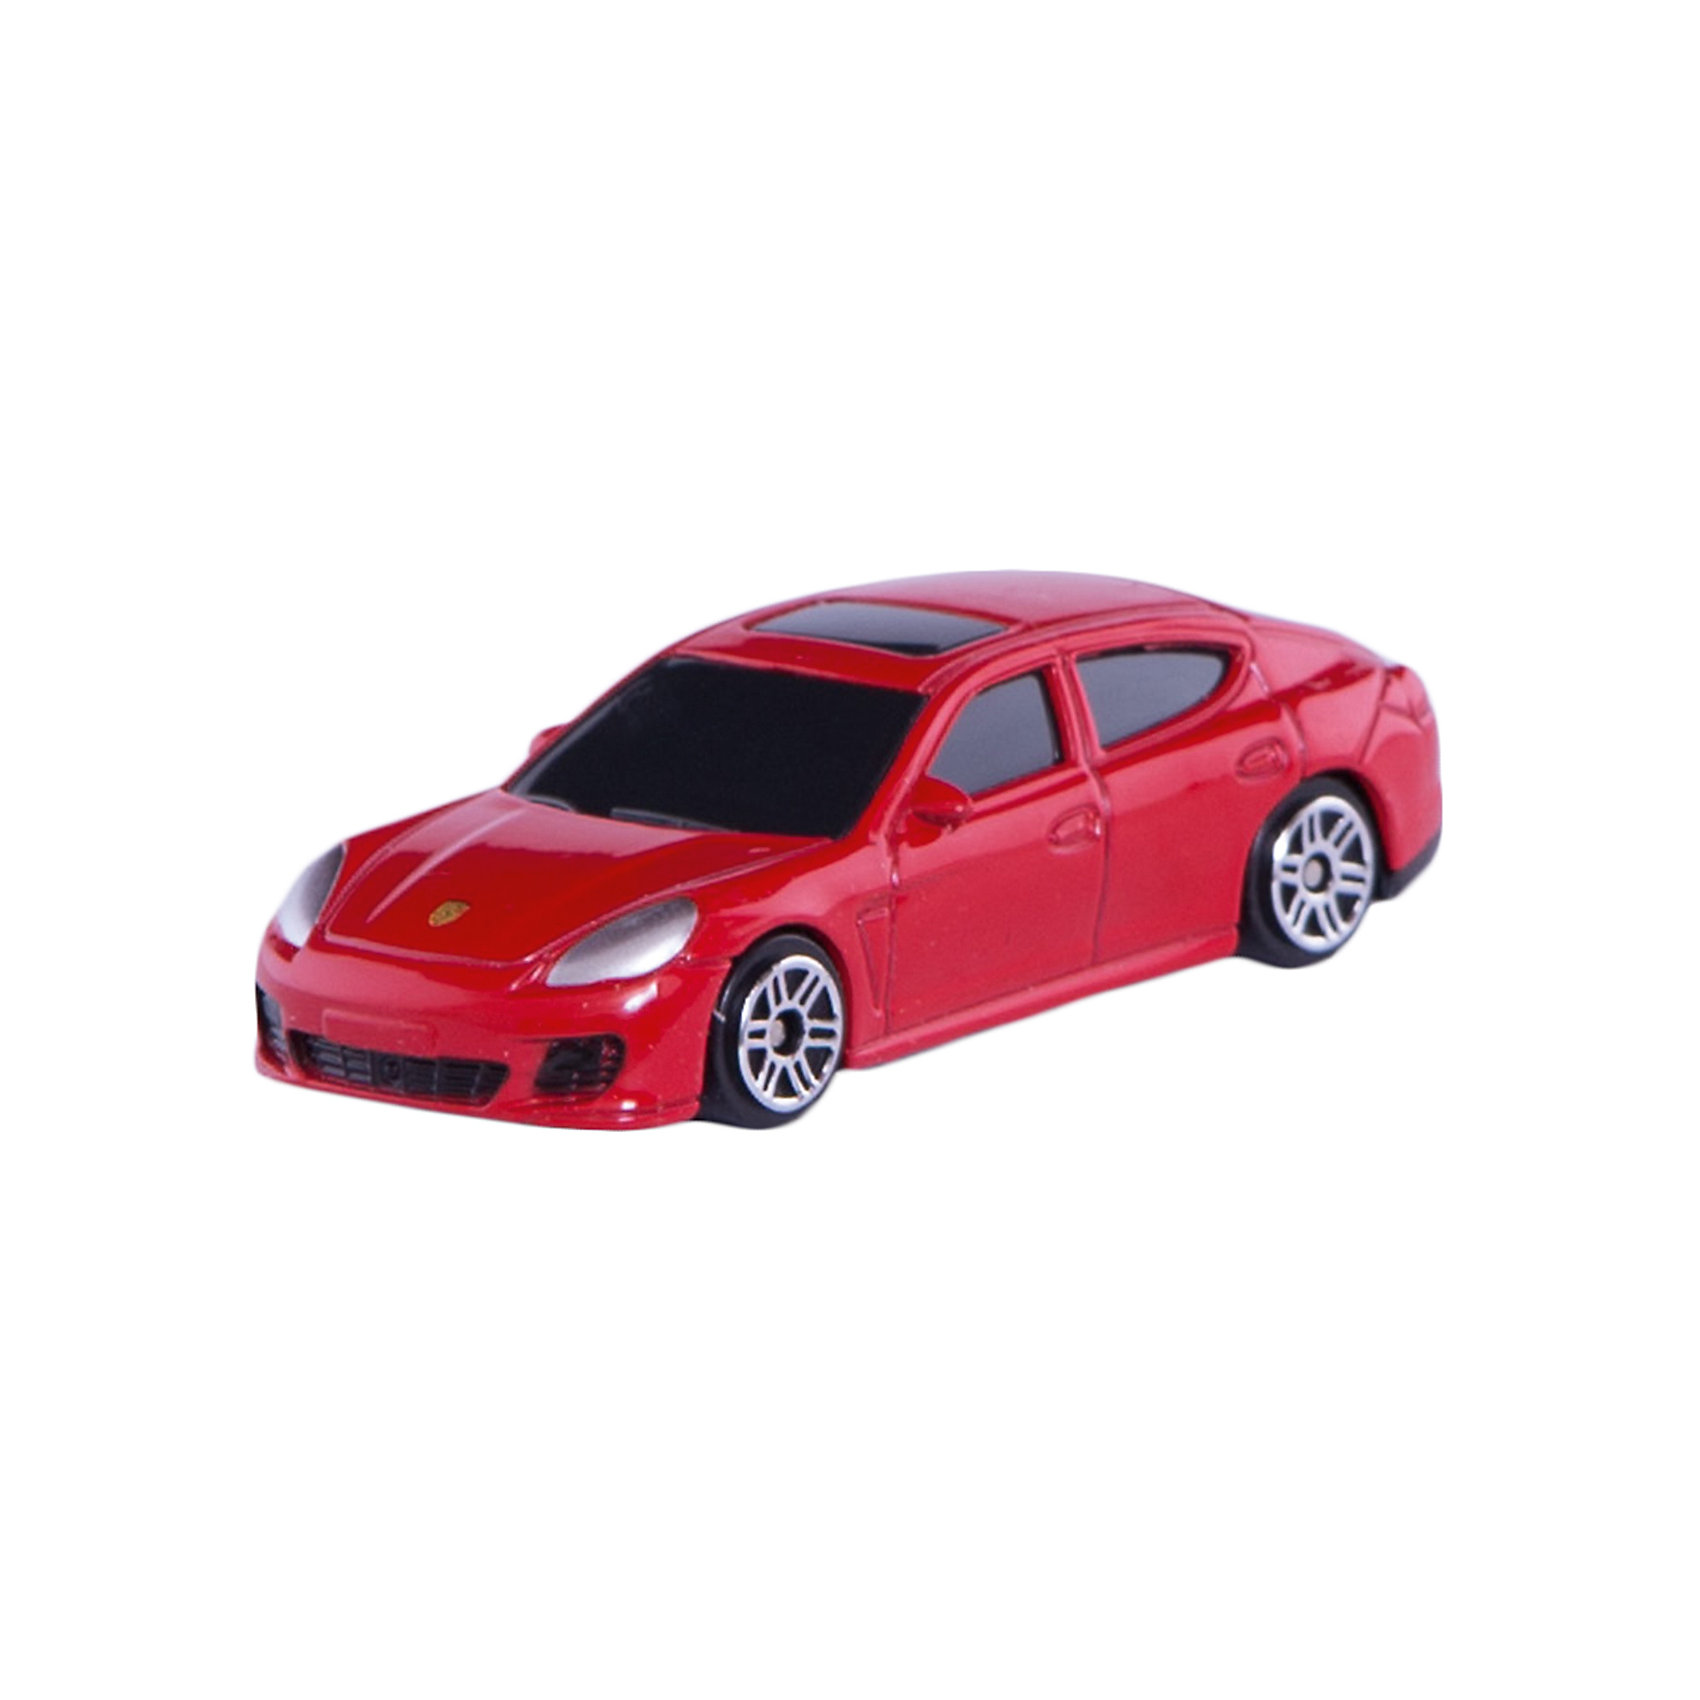 Машинка Porsche Panamera Turbo Jeans 3, AutotimeМашинки<br><br><br>Ширина мм: 90<br>Глубина мм: 42<br>Высота мм: 40<br>Вес г: 14<br>Возраст от месяцев: 36<br>Возраст до месяцев: 2147483647<br>Пол: Мужской<br>Возраст: Детский<br>SKU: 5584072